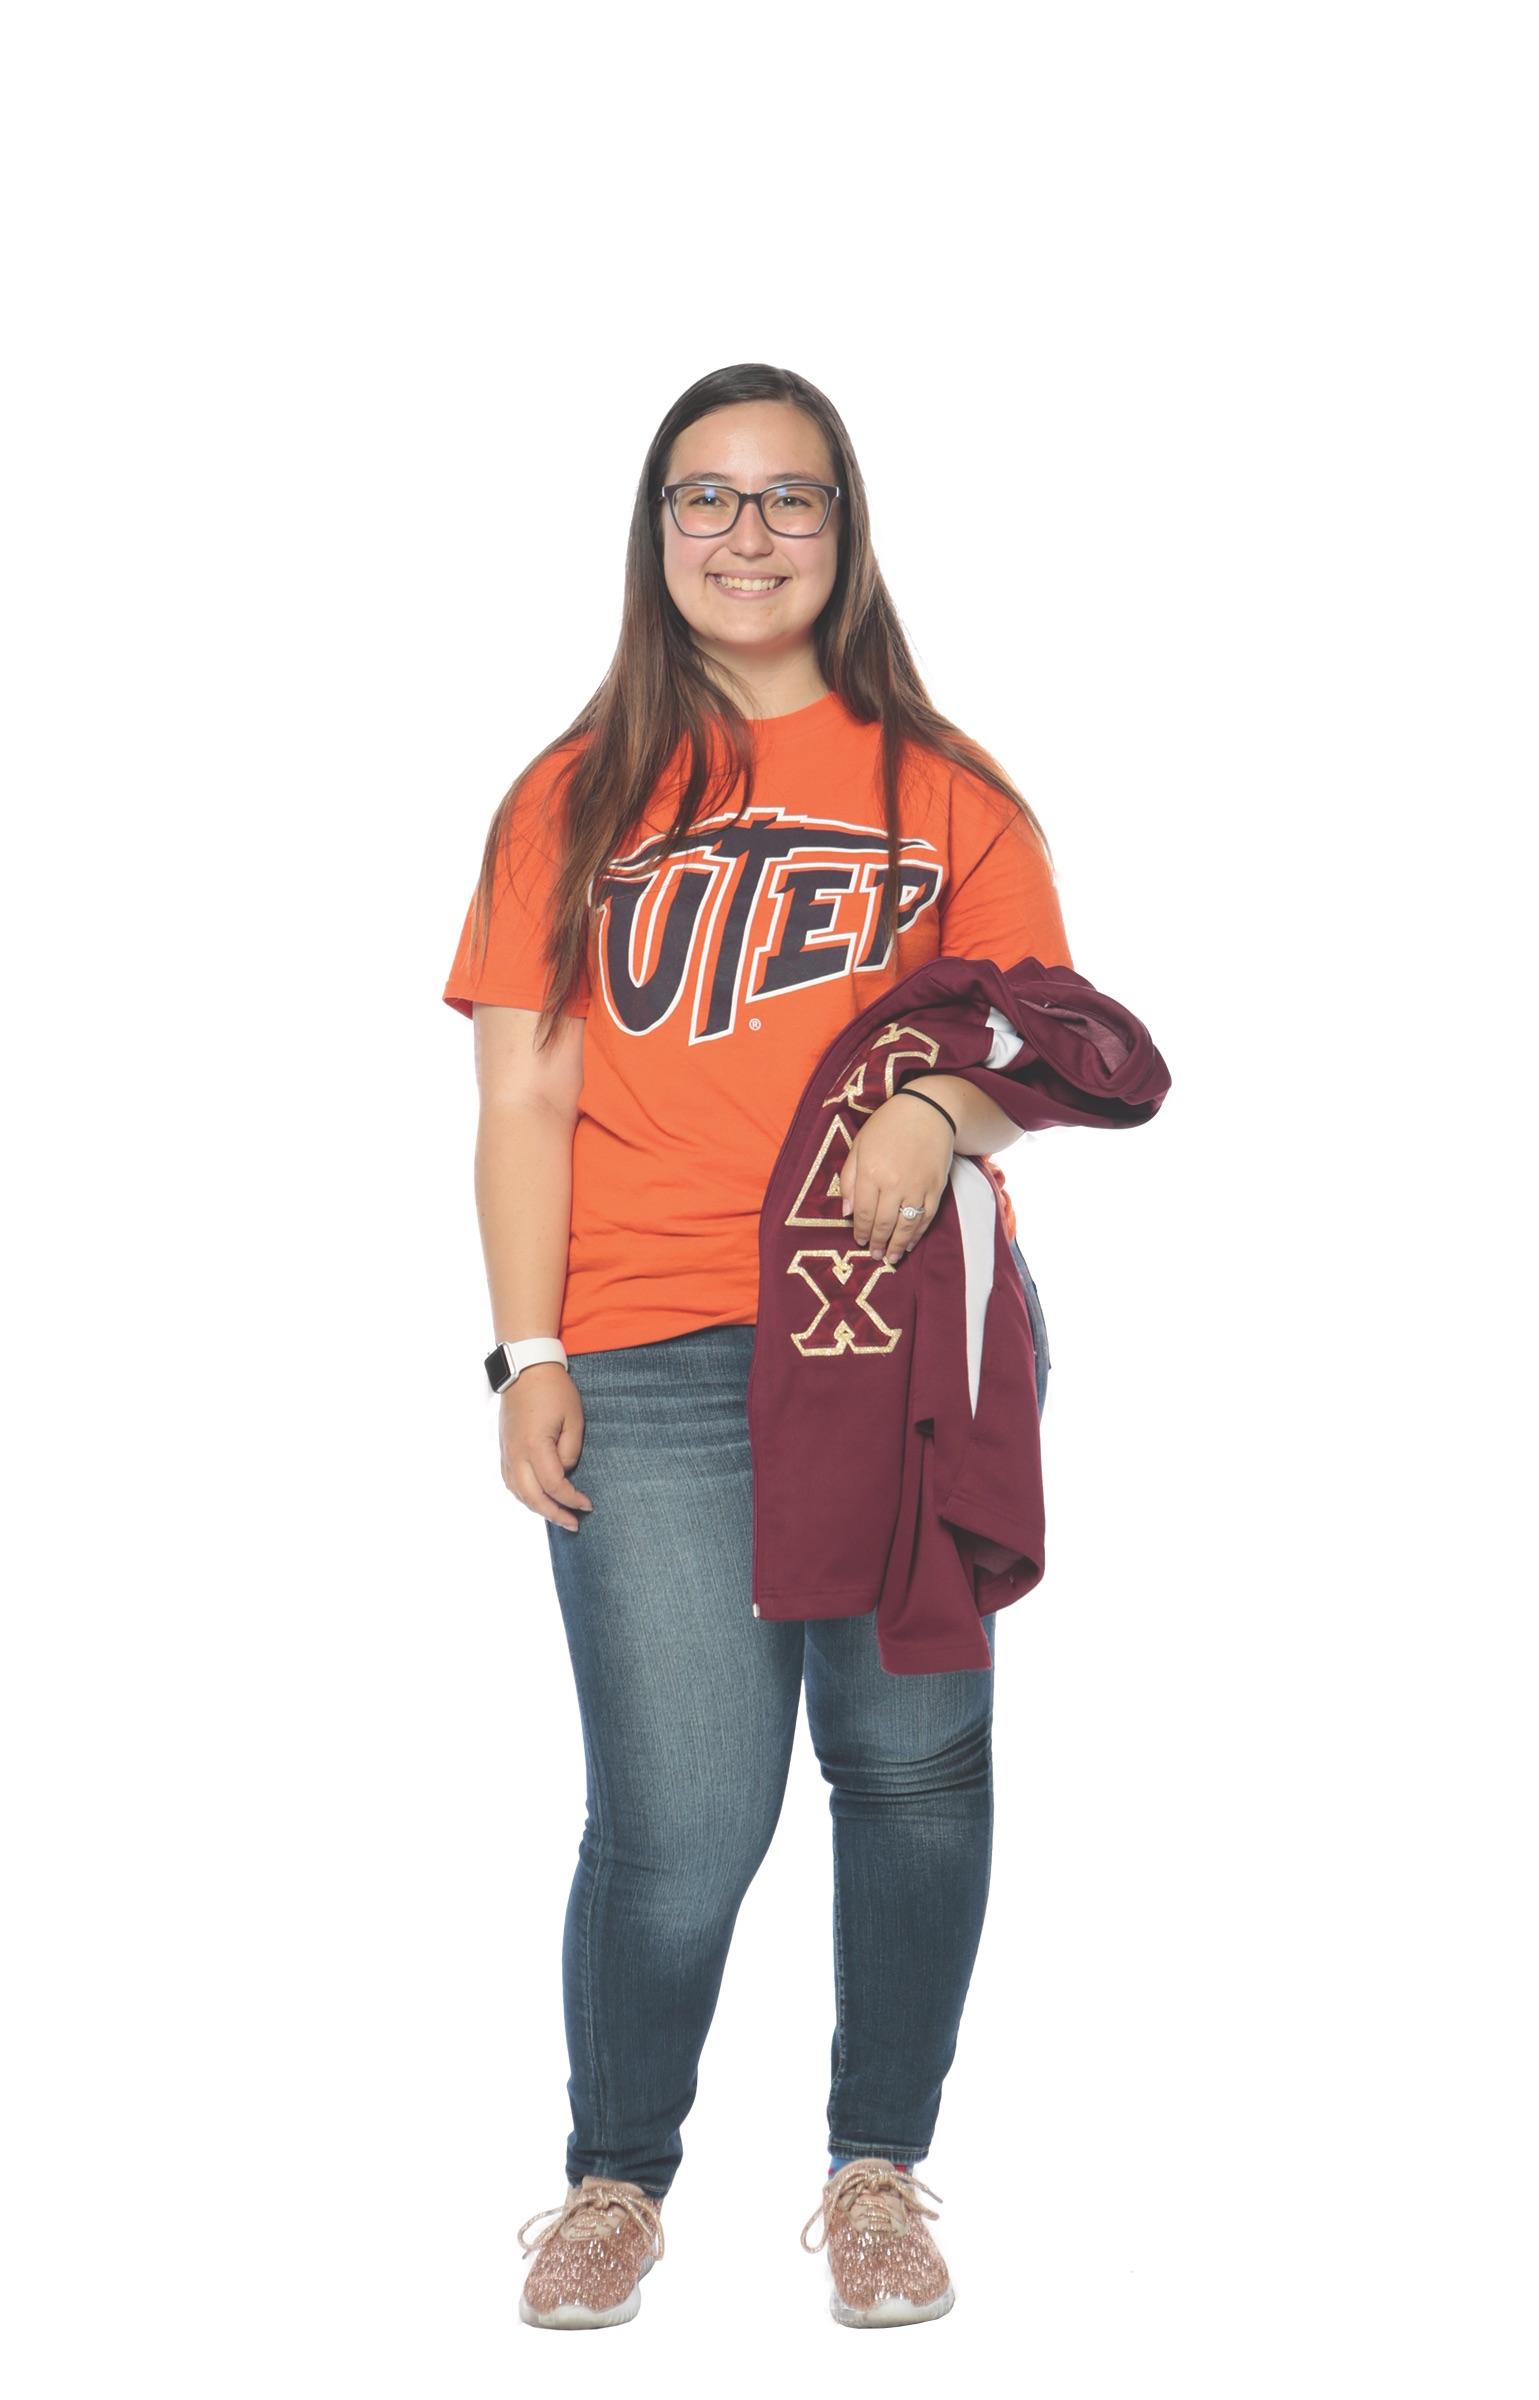 Brianna Brogdon-Gilbert, Sociology major